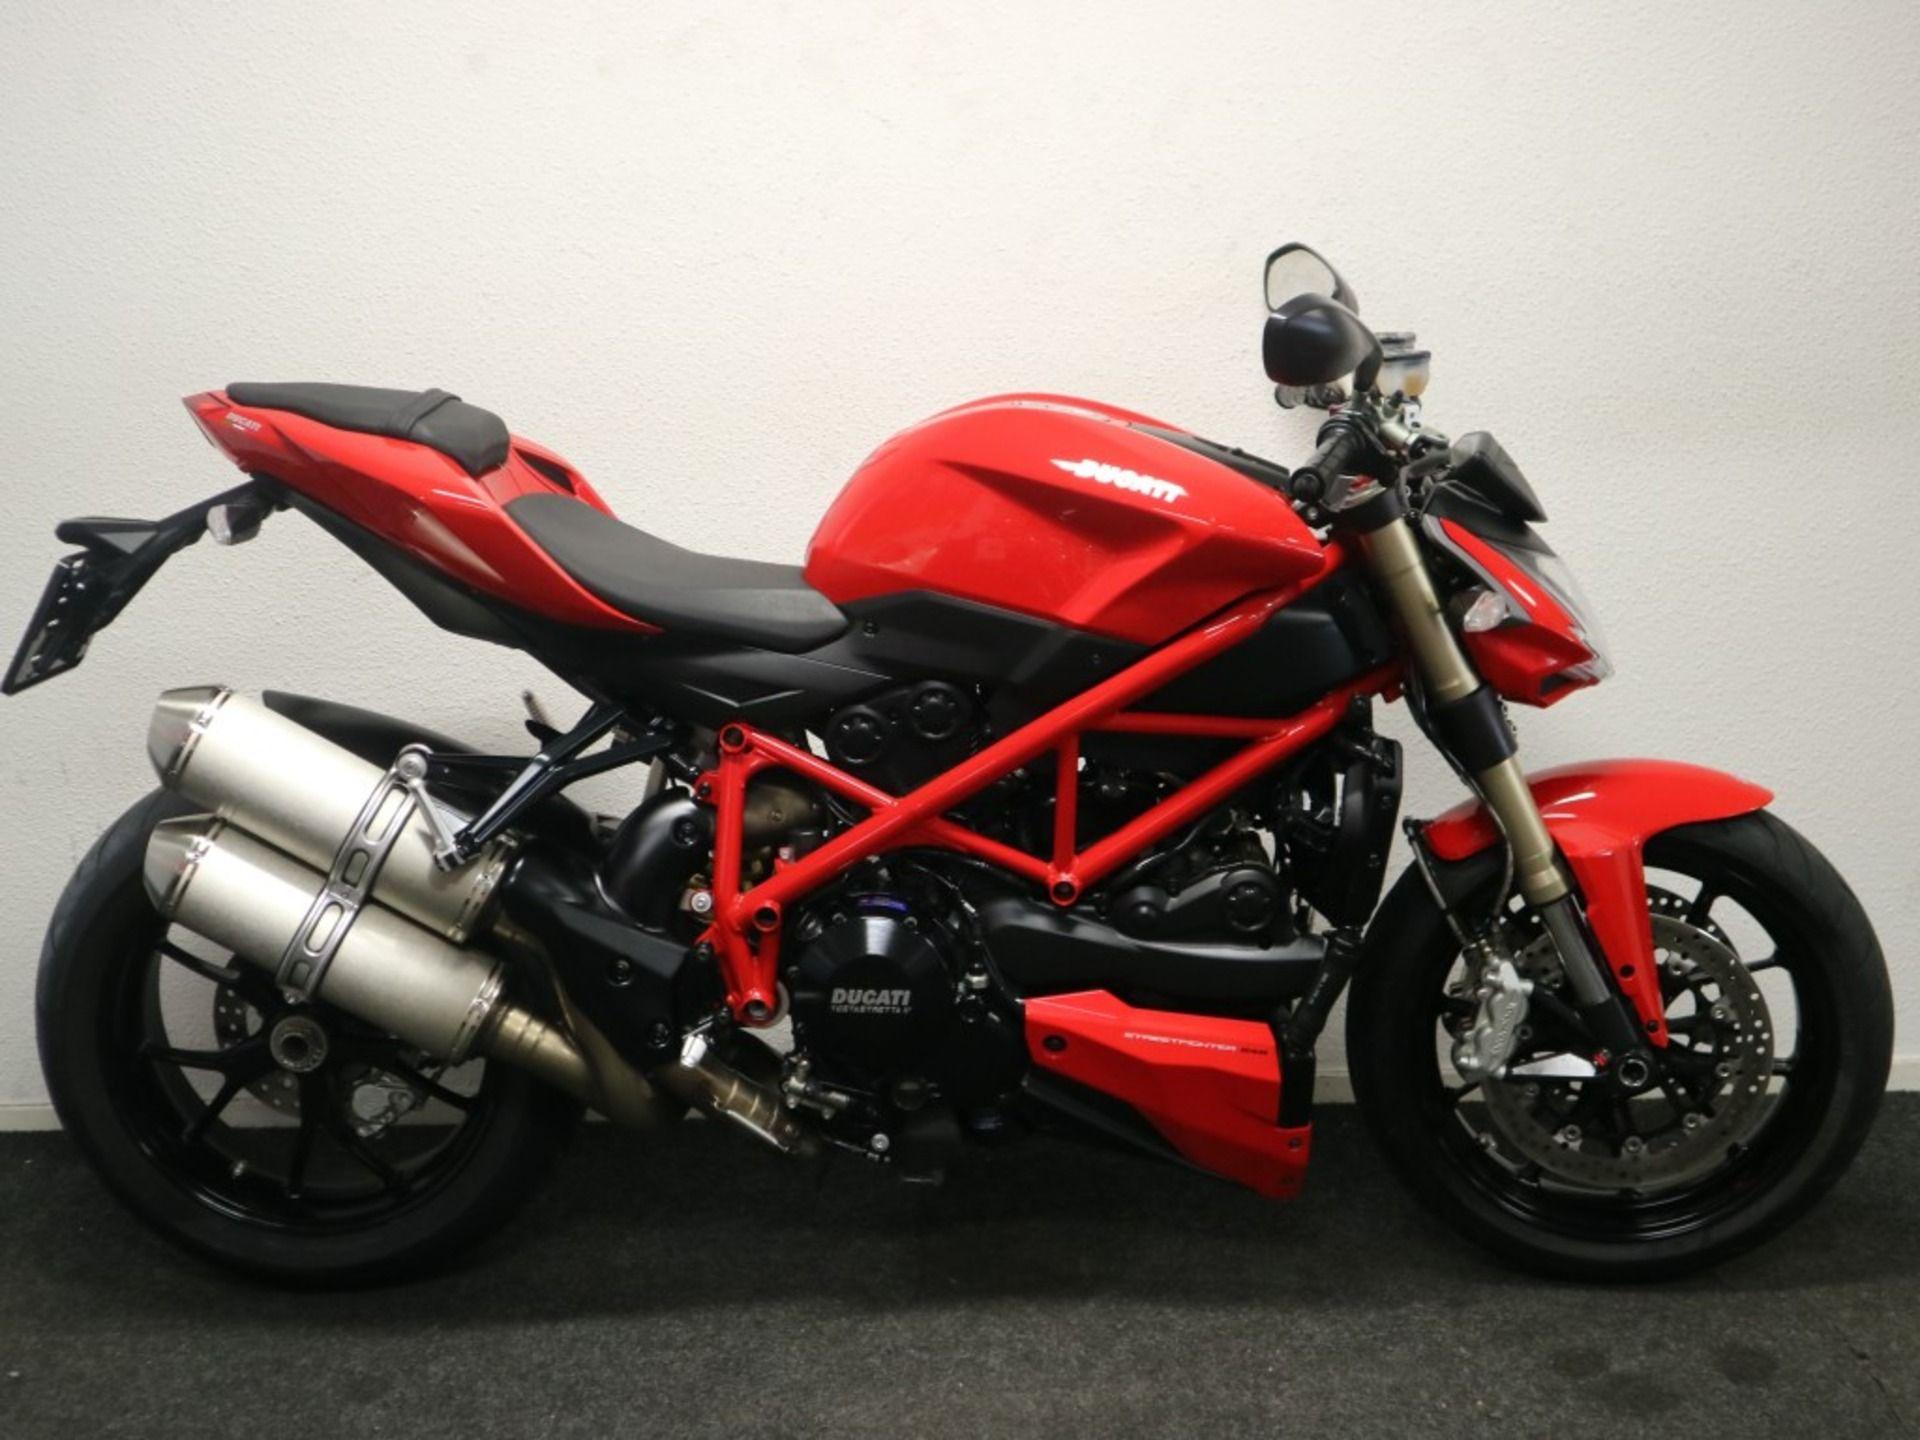 Ducati Streetfighter 848 Motoroccasion Nl Ducati